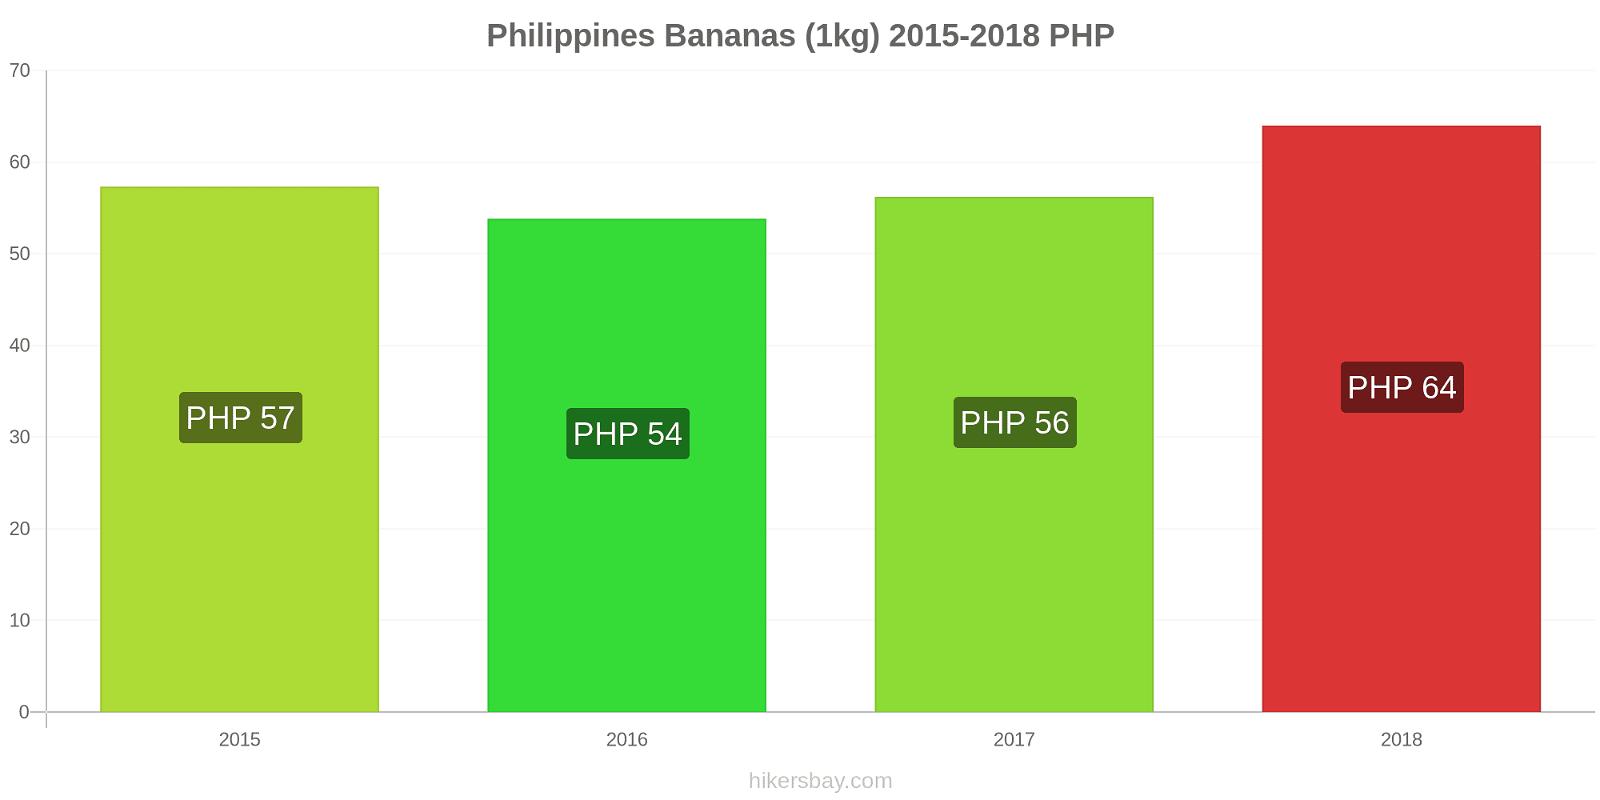 Philippines price changes Bananas (1kg) hikersbay.com